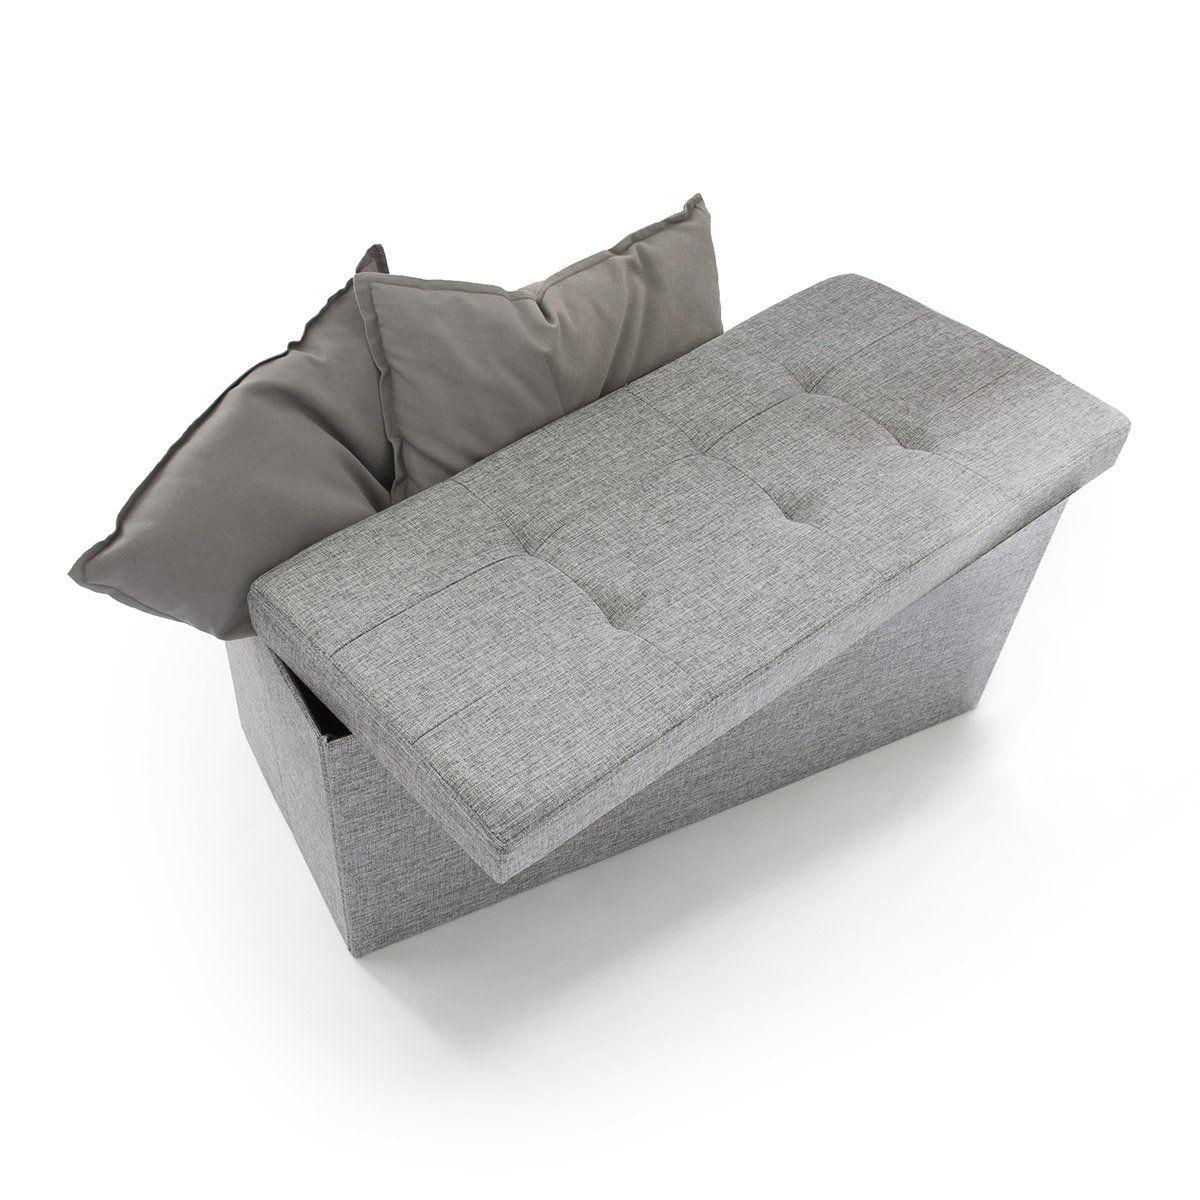 Relaxdays Sitzbank mit Stauraum Leinen faltbar 76x38x38cm stabil Sitztruhe Sitzhocker grau